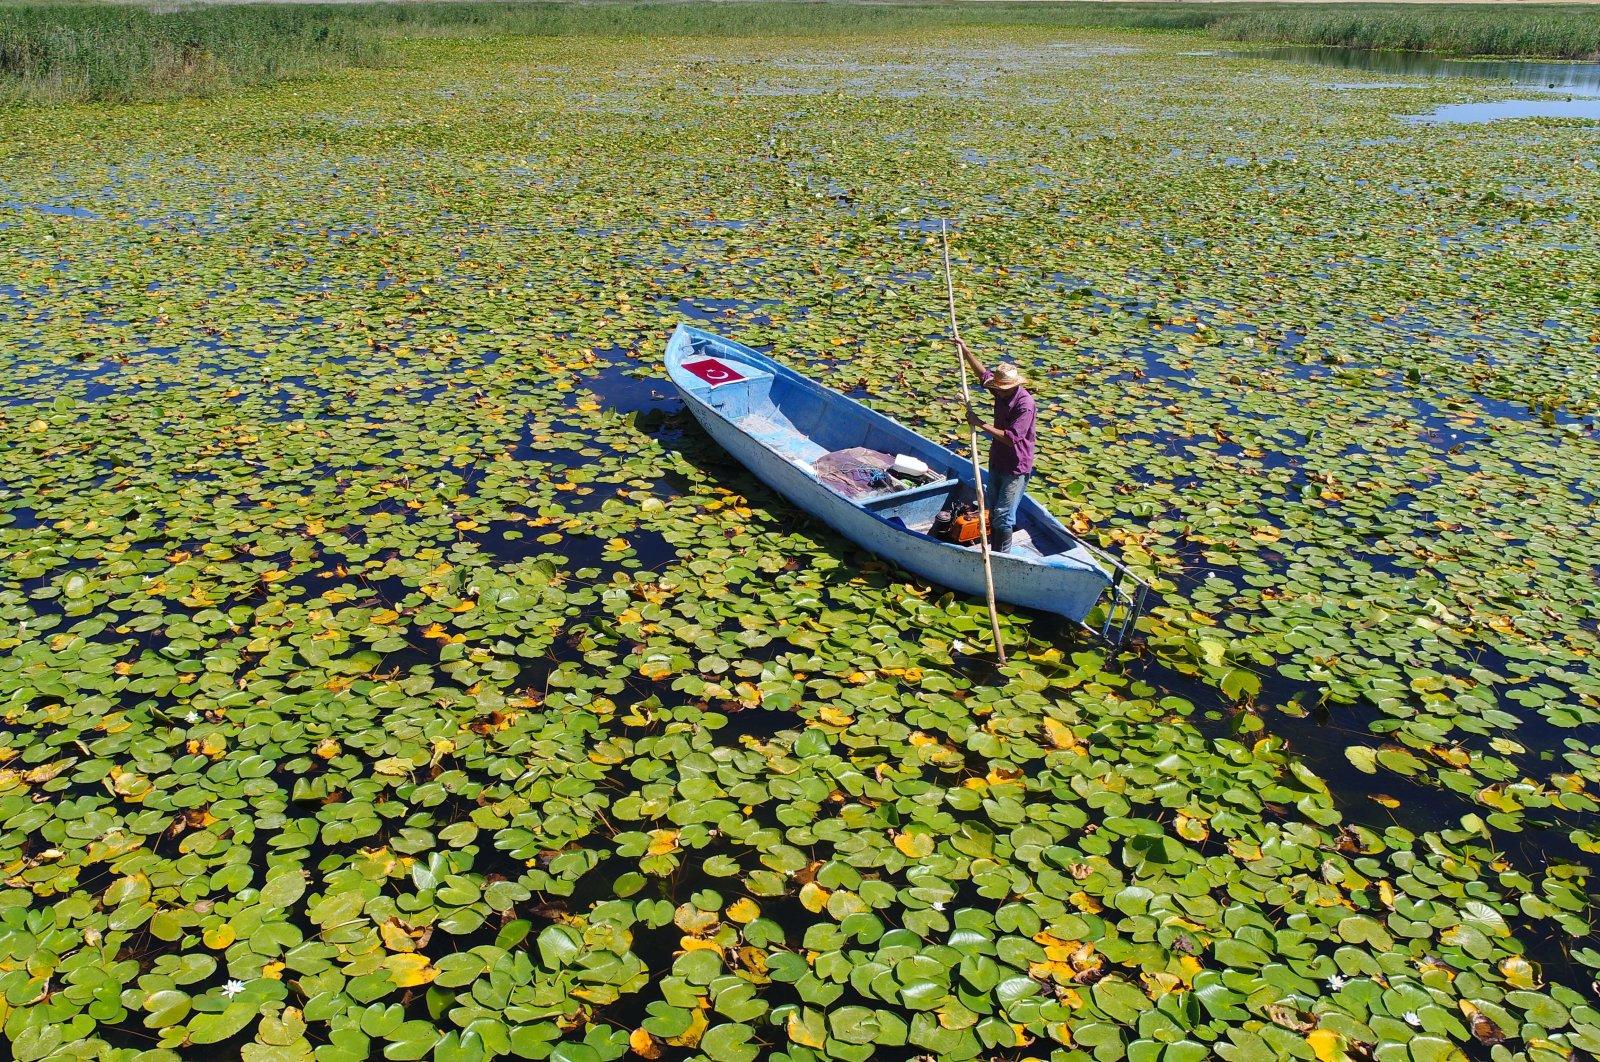 A fisherman rides on his boat through a sea of water lilies in Lake Beyşehir, Konya, Aug. 20, 2020. (DHA Photo)